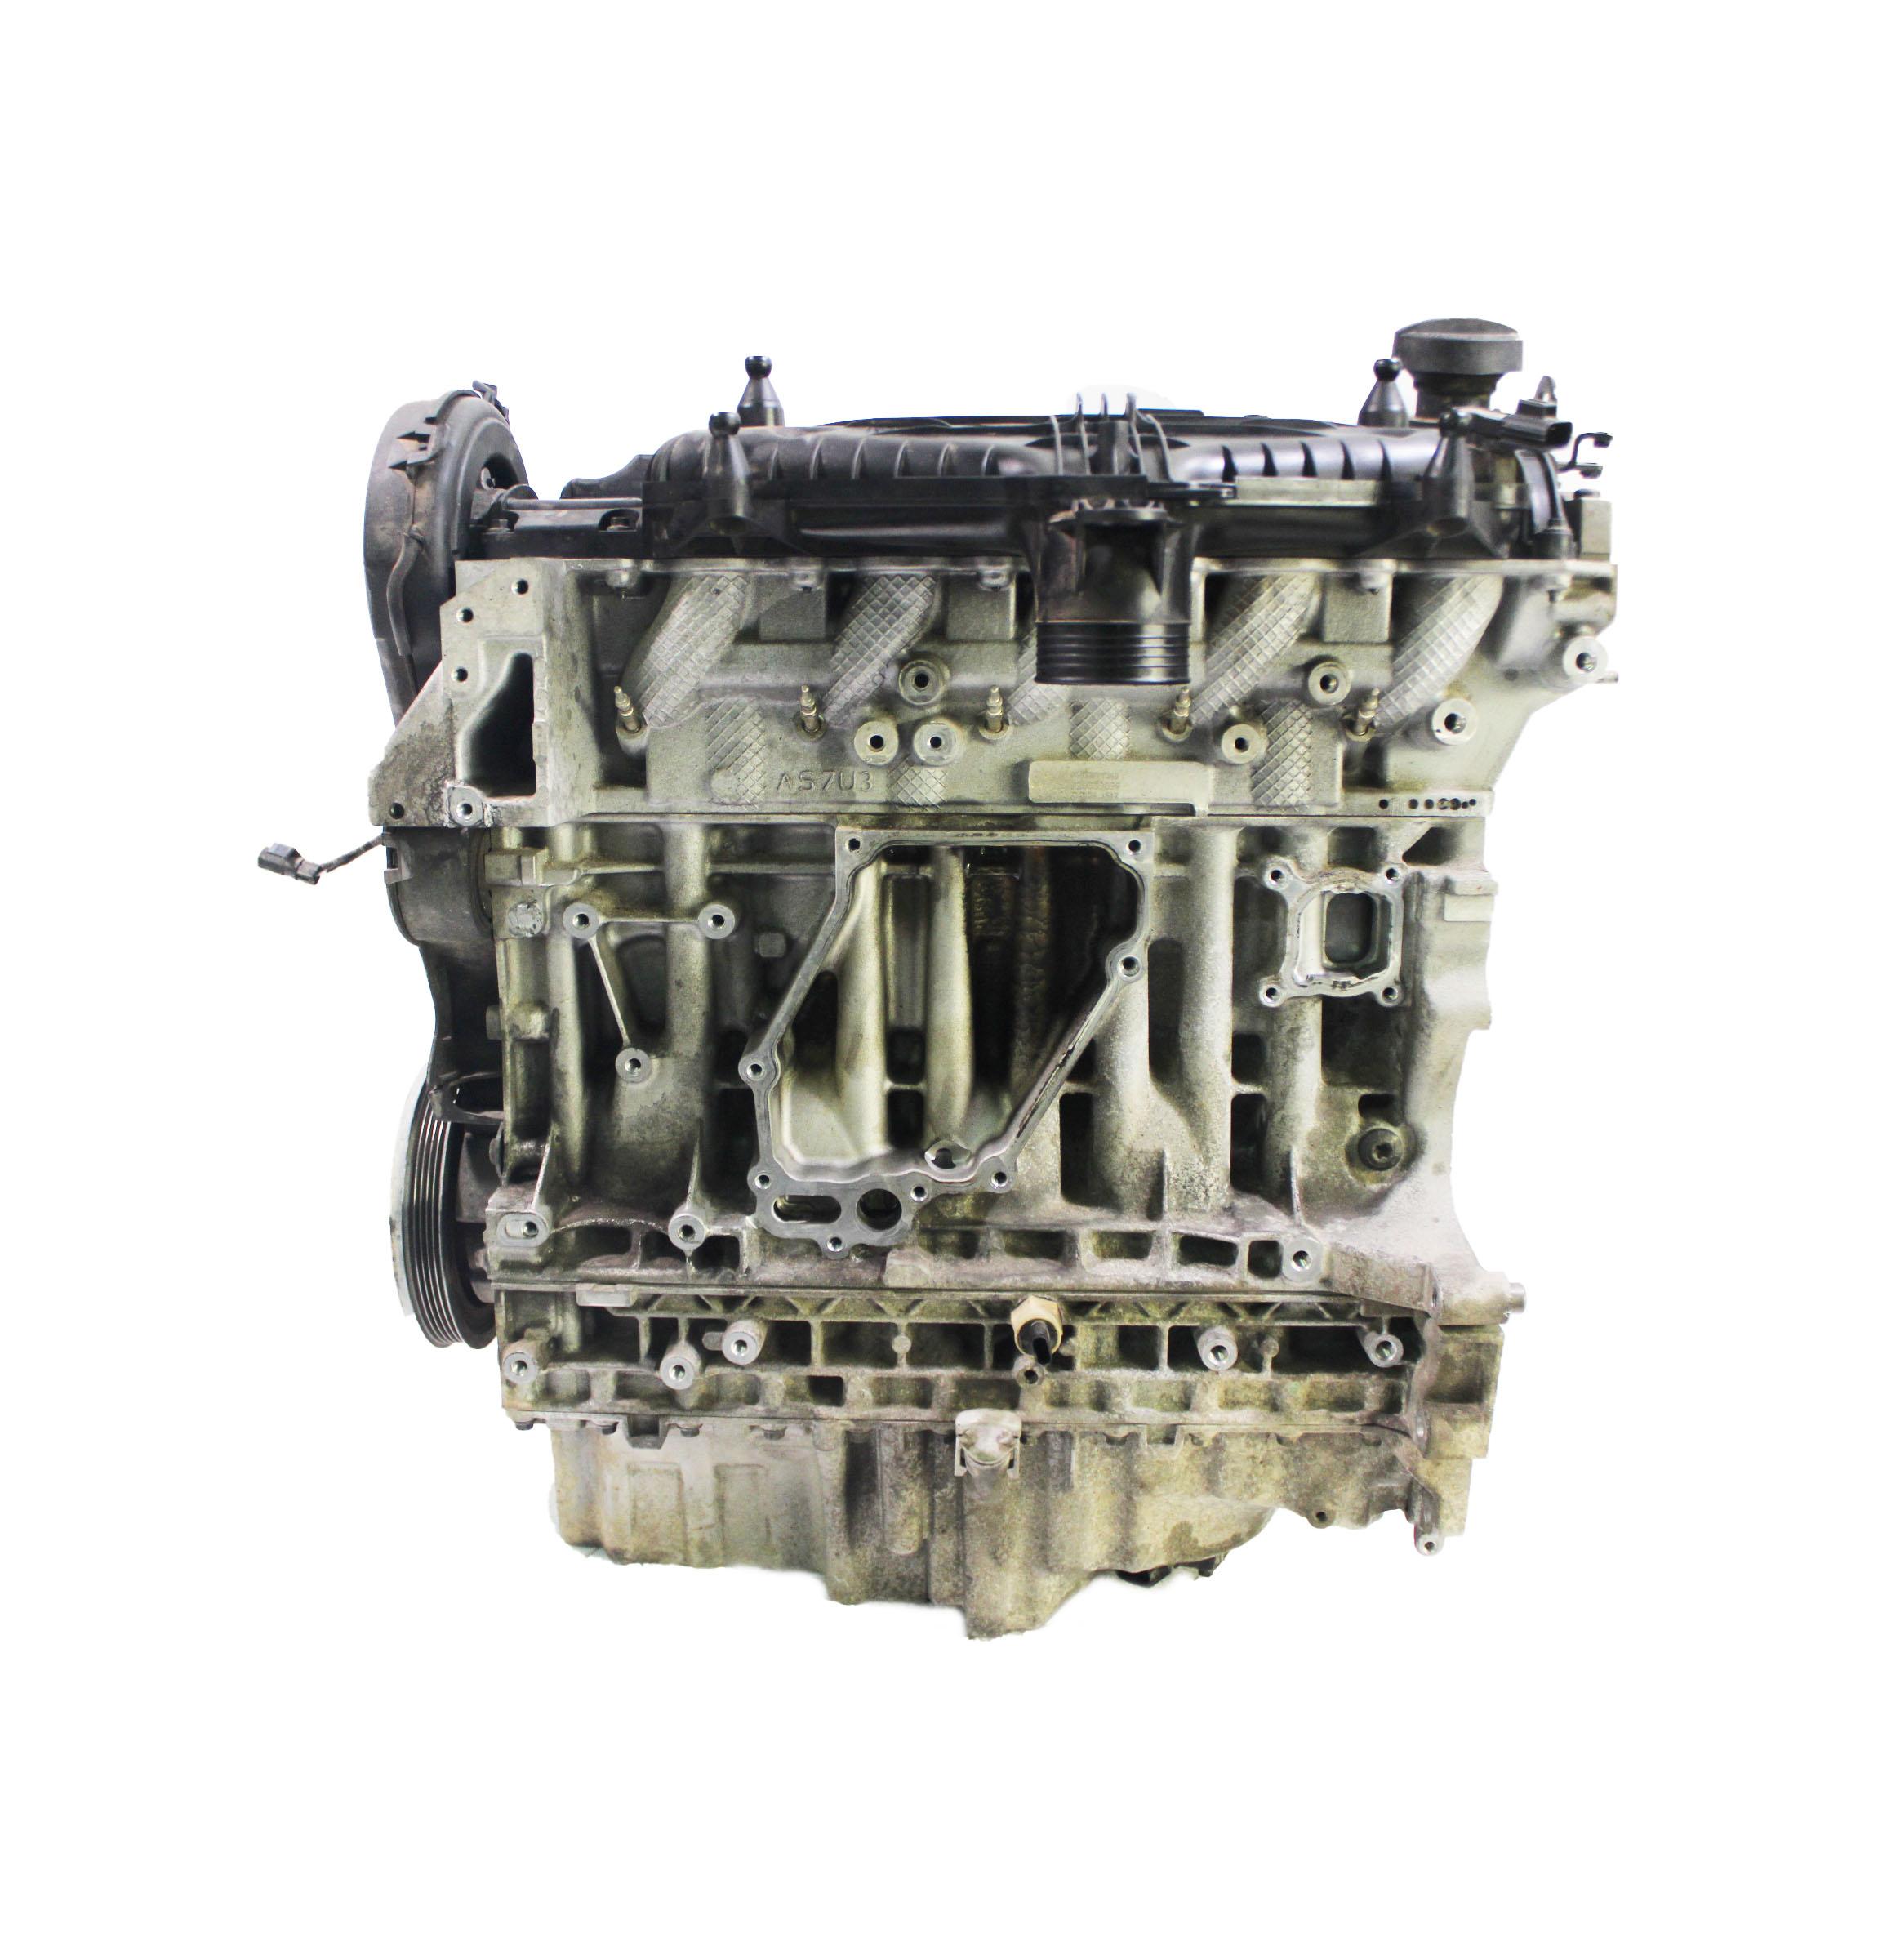 Motor für Volvo V60 155 157 2,0 D4 Diesel D5204T3 163 PS